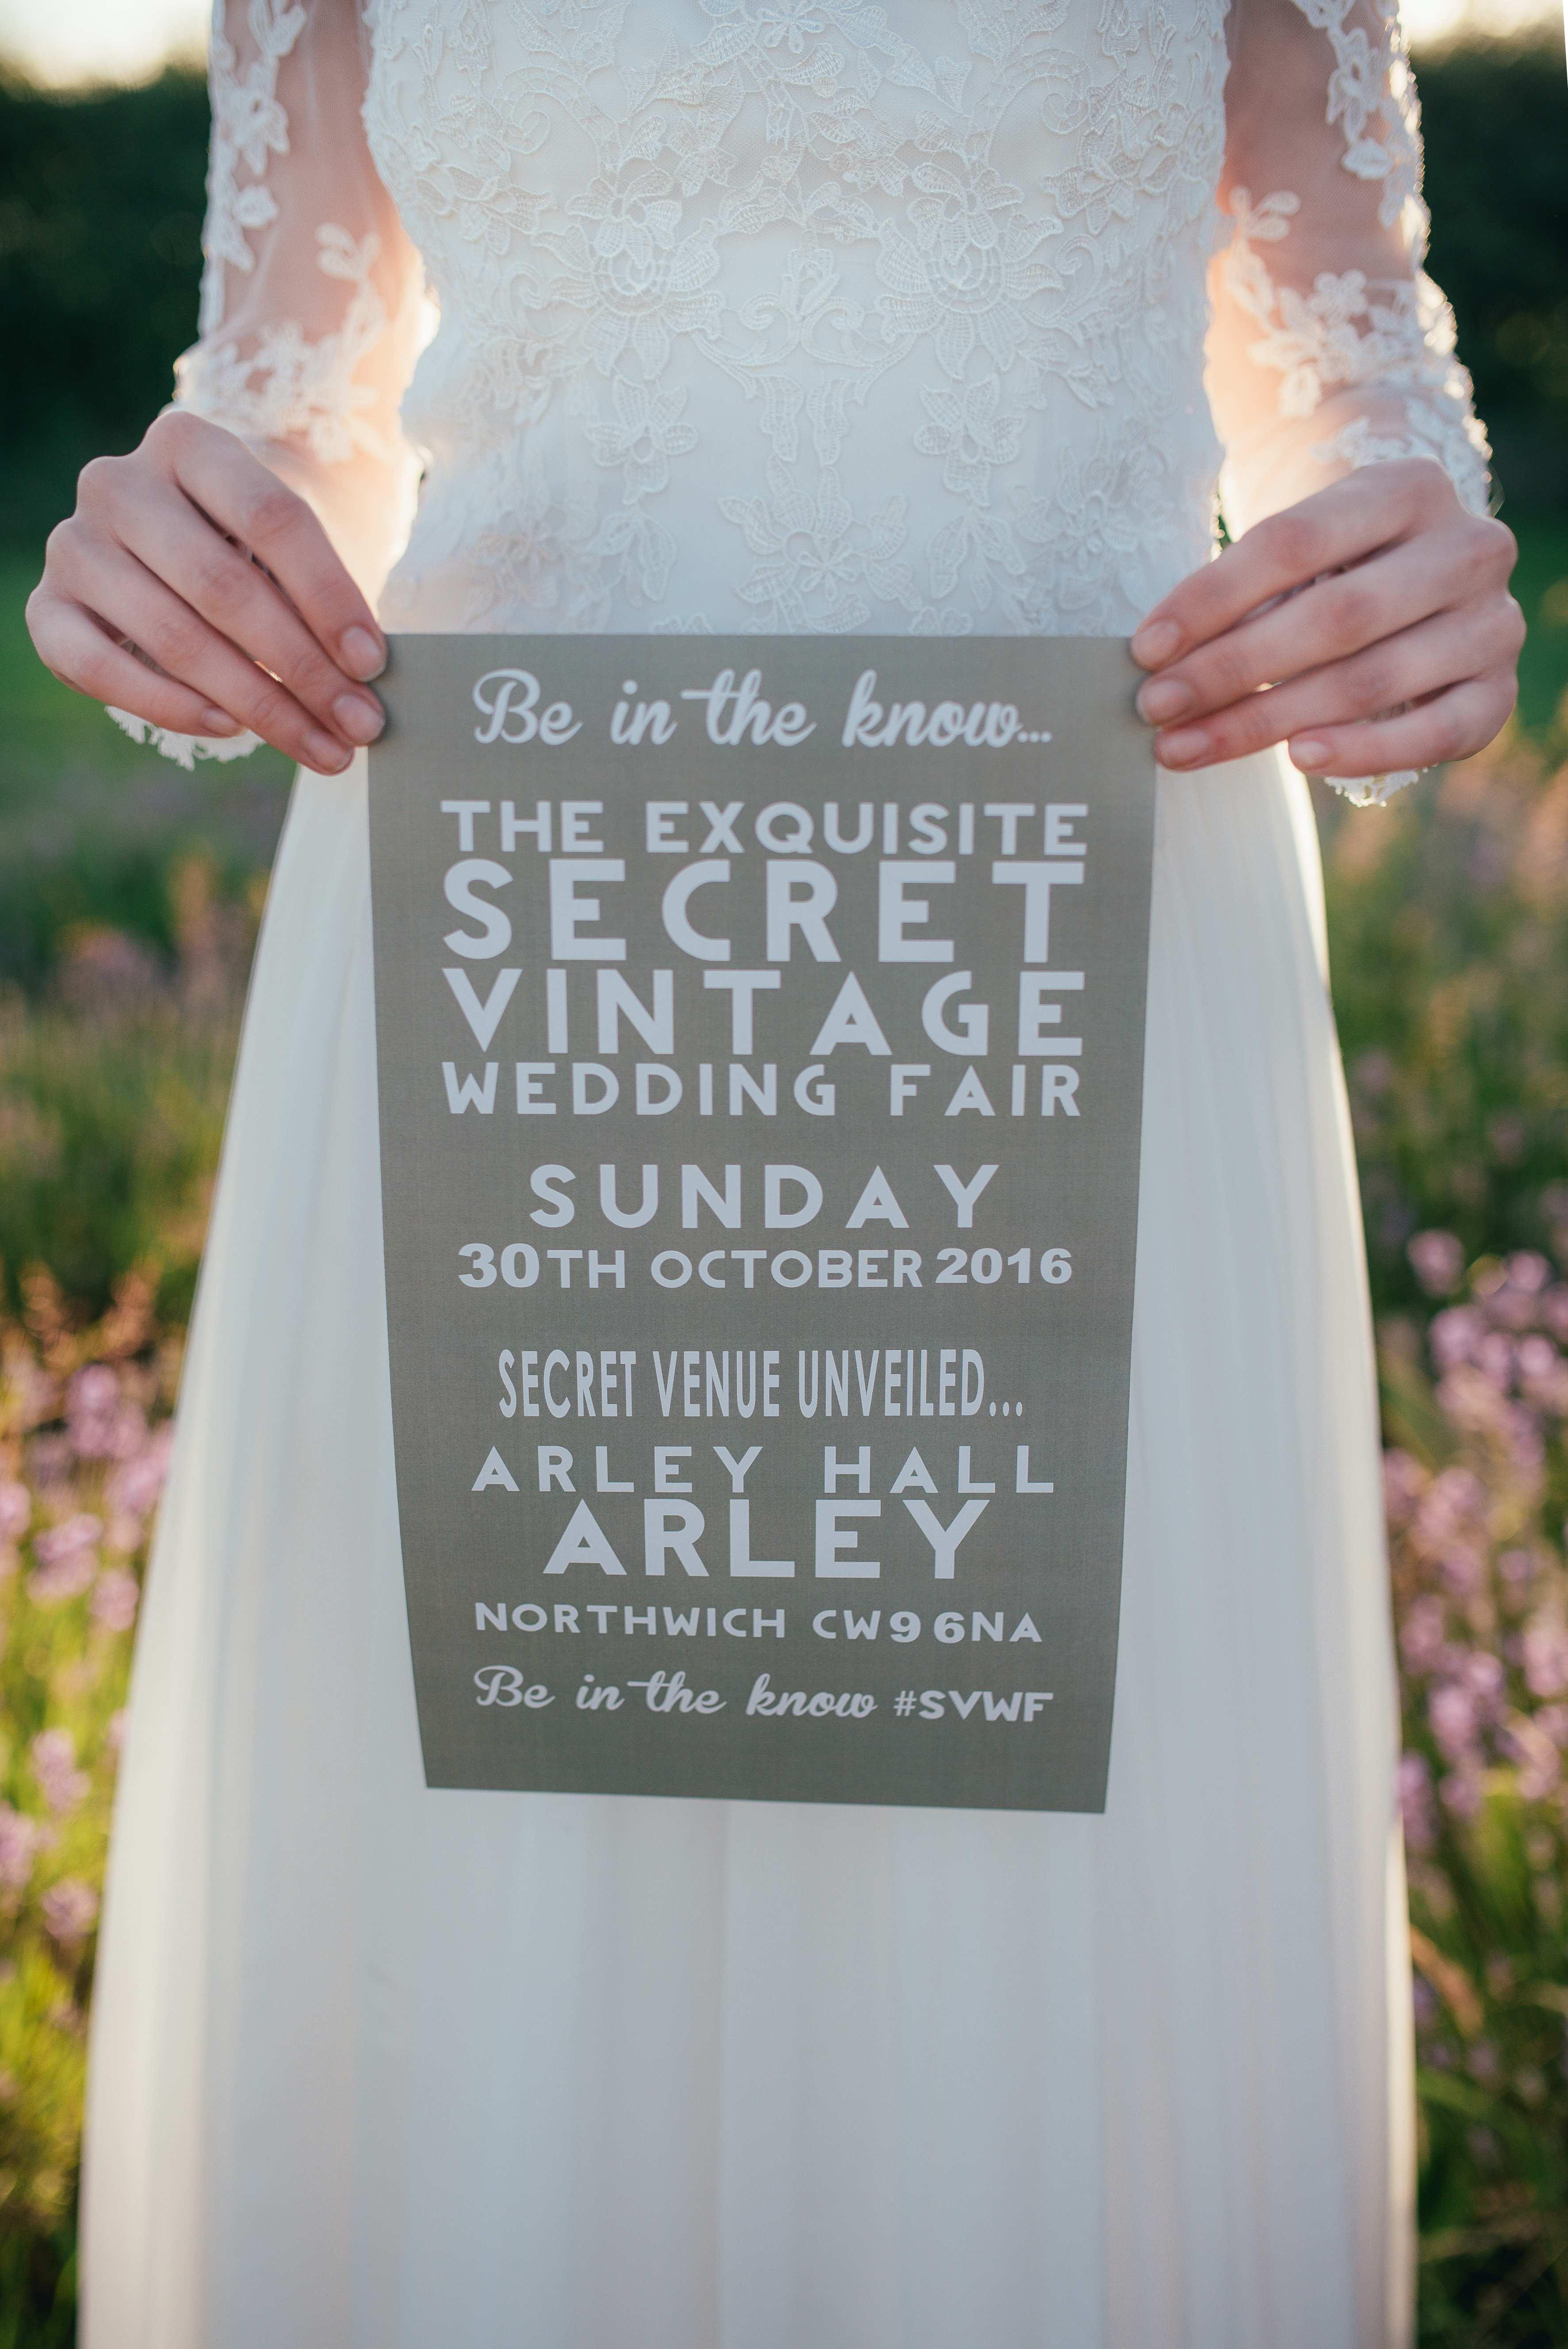 poster of the secret vintage wedding fair